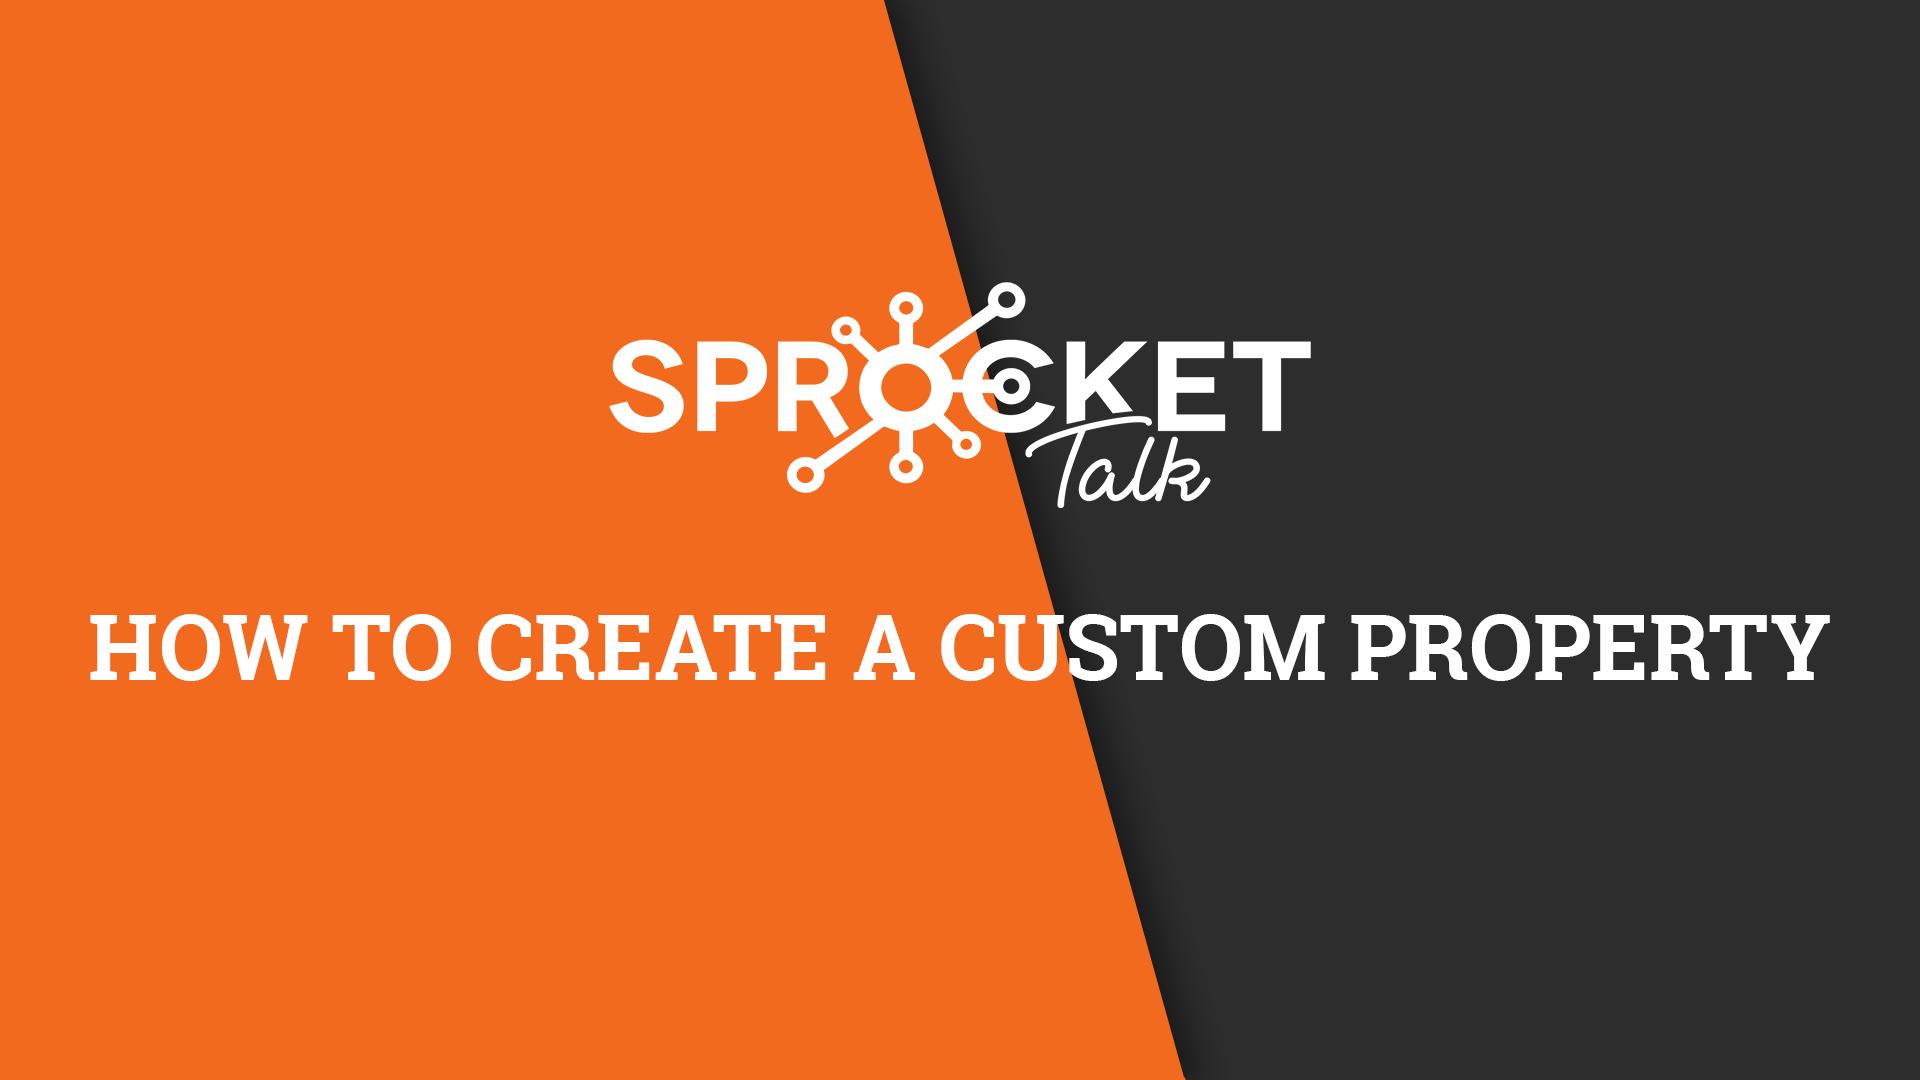 How to Create a Custom Property